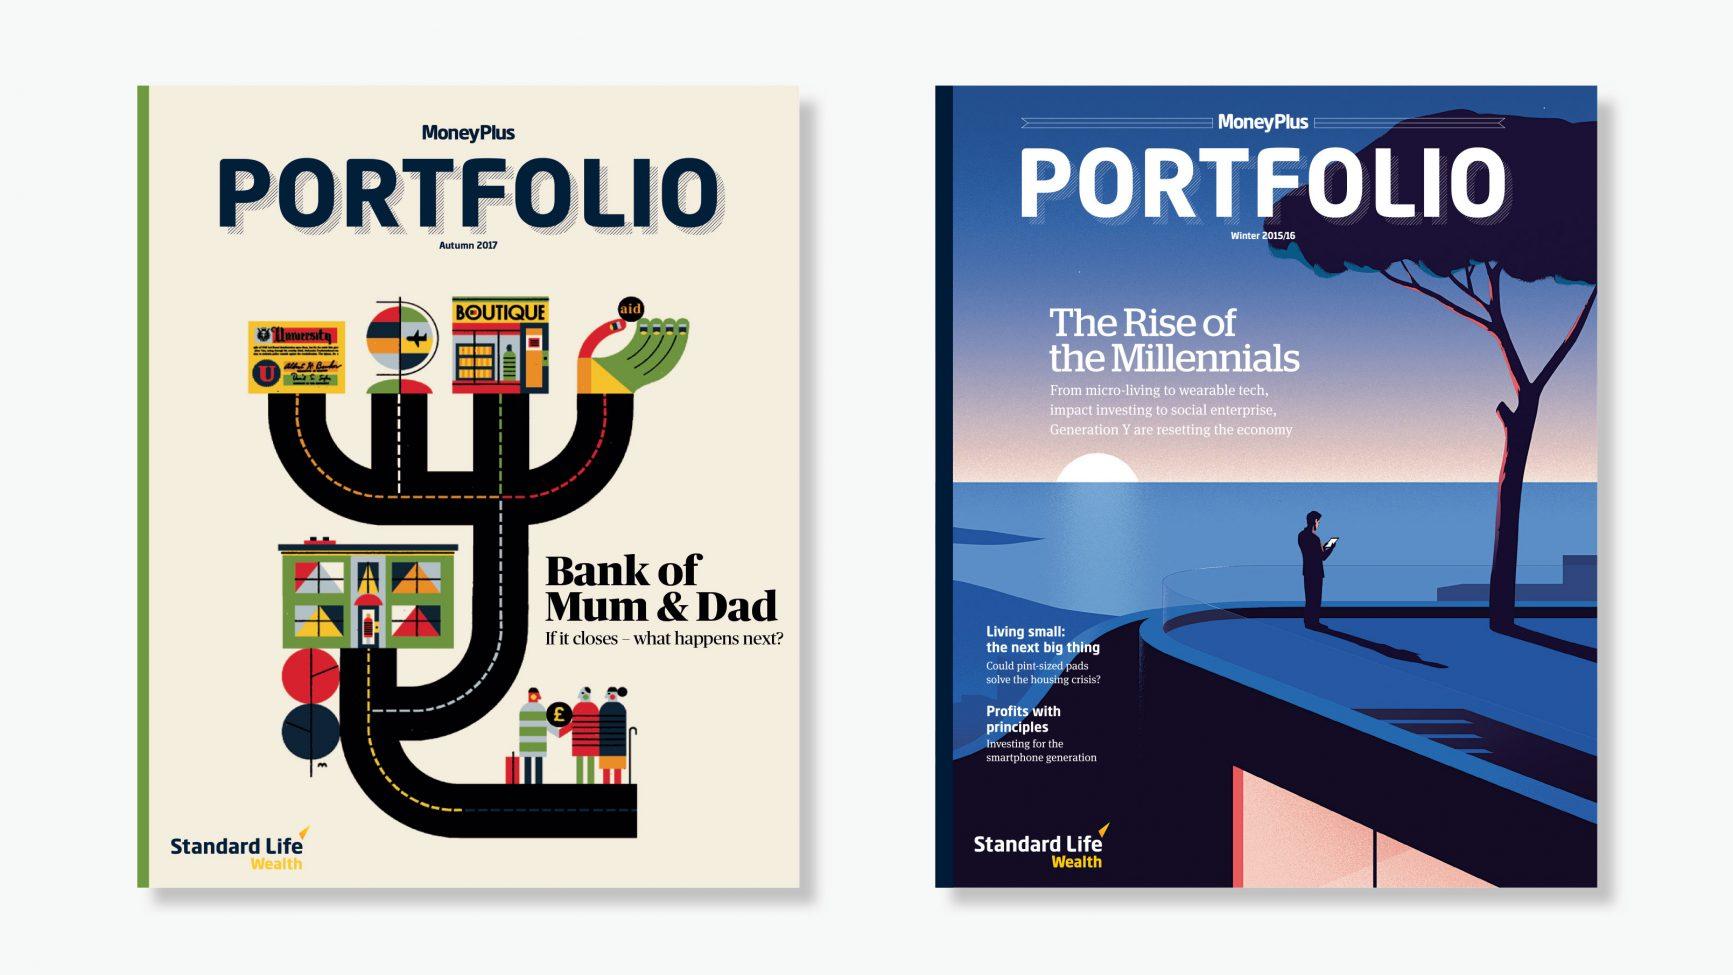 money plus portfolio magazine millennial banking raymond biesinger thomas danthony